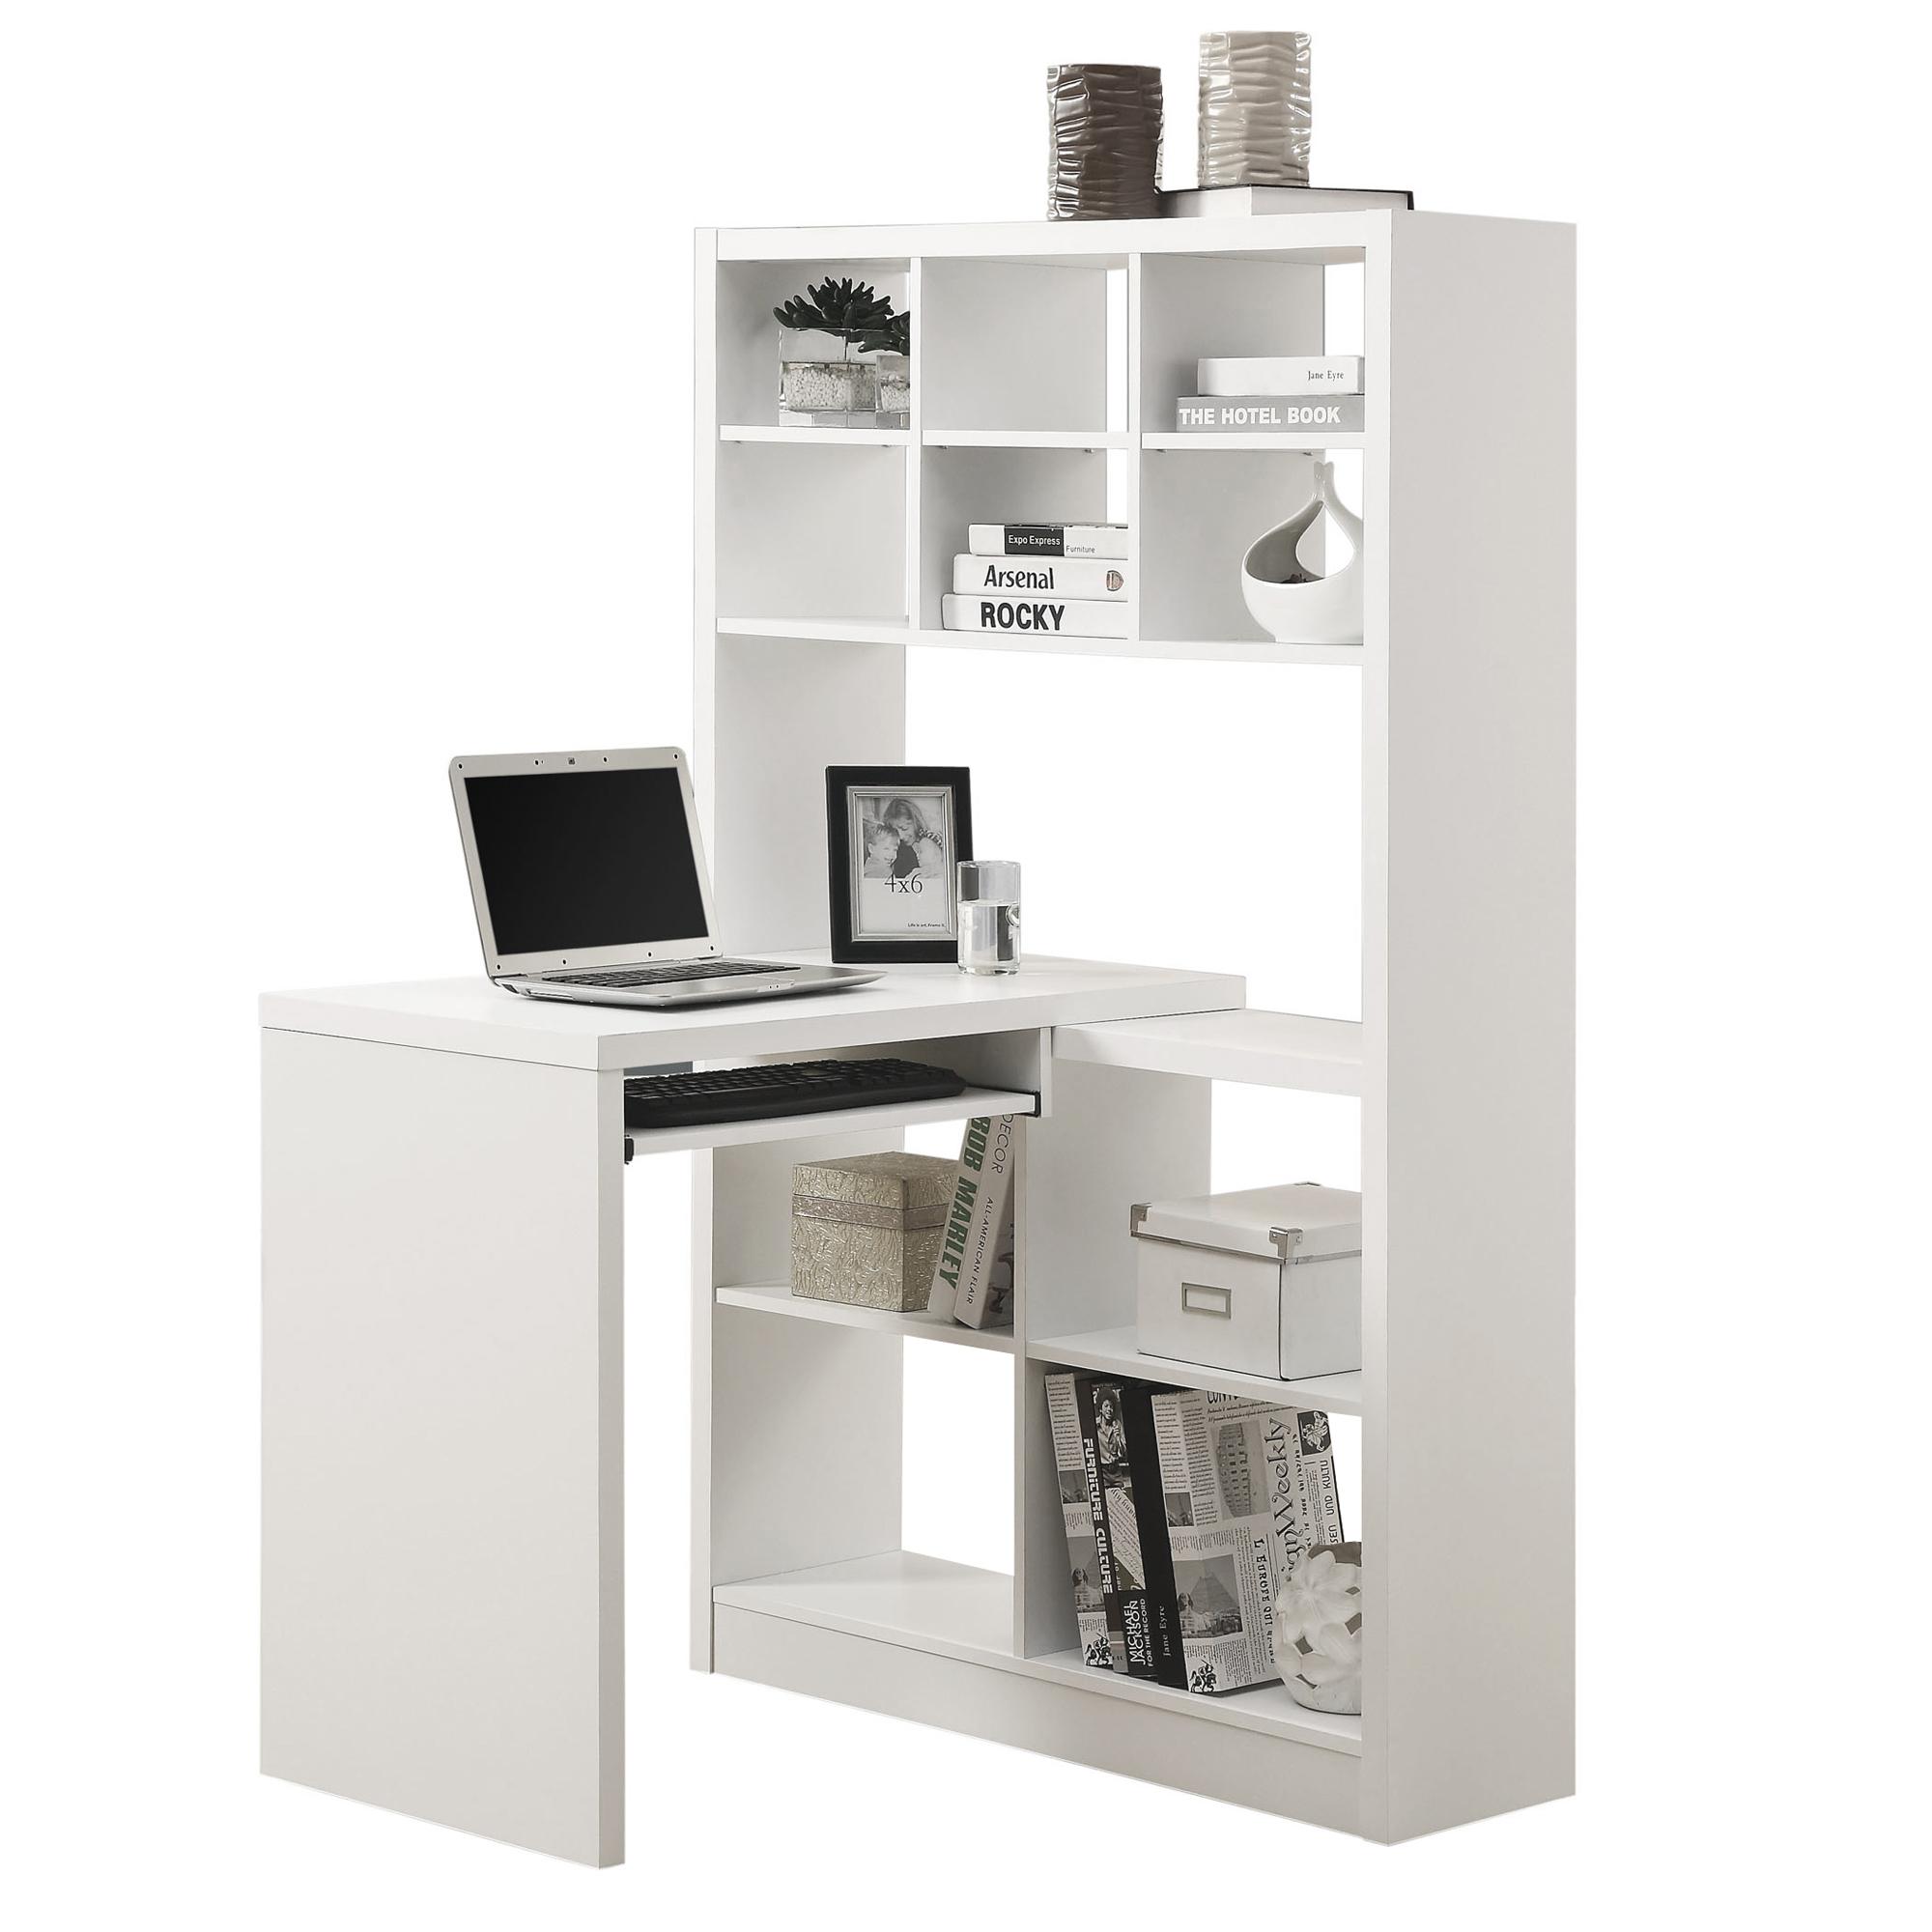 "38"" x 35.5"" x 60"" White Particle Board Hollow Core  Computer Desk"